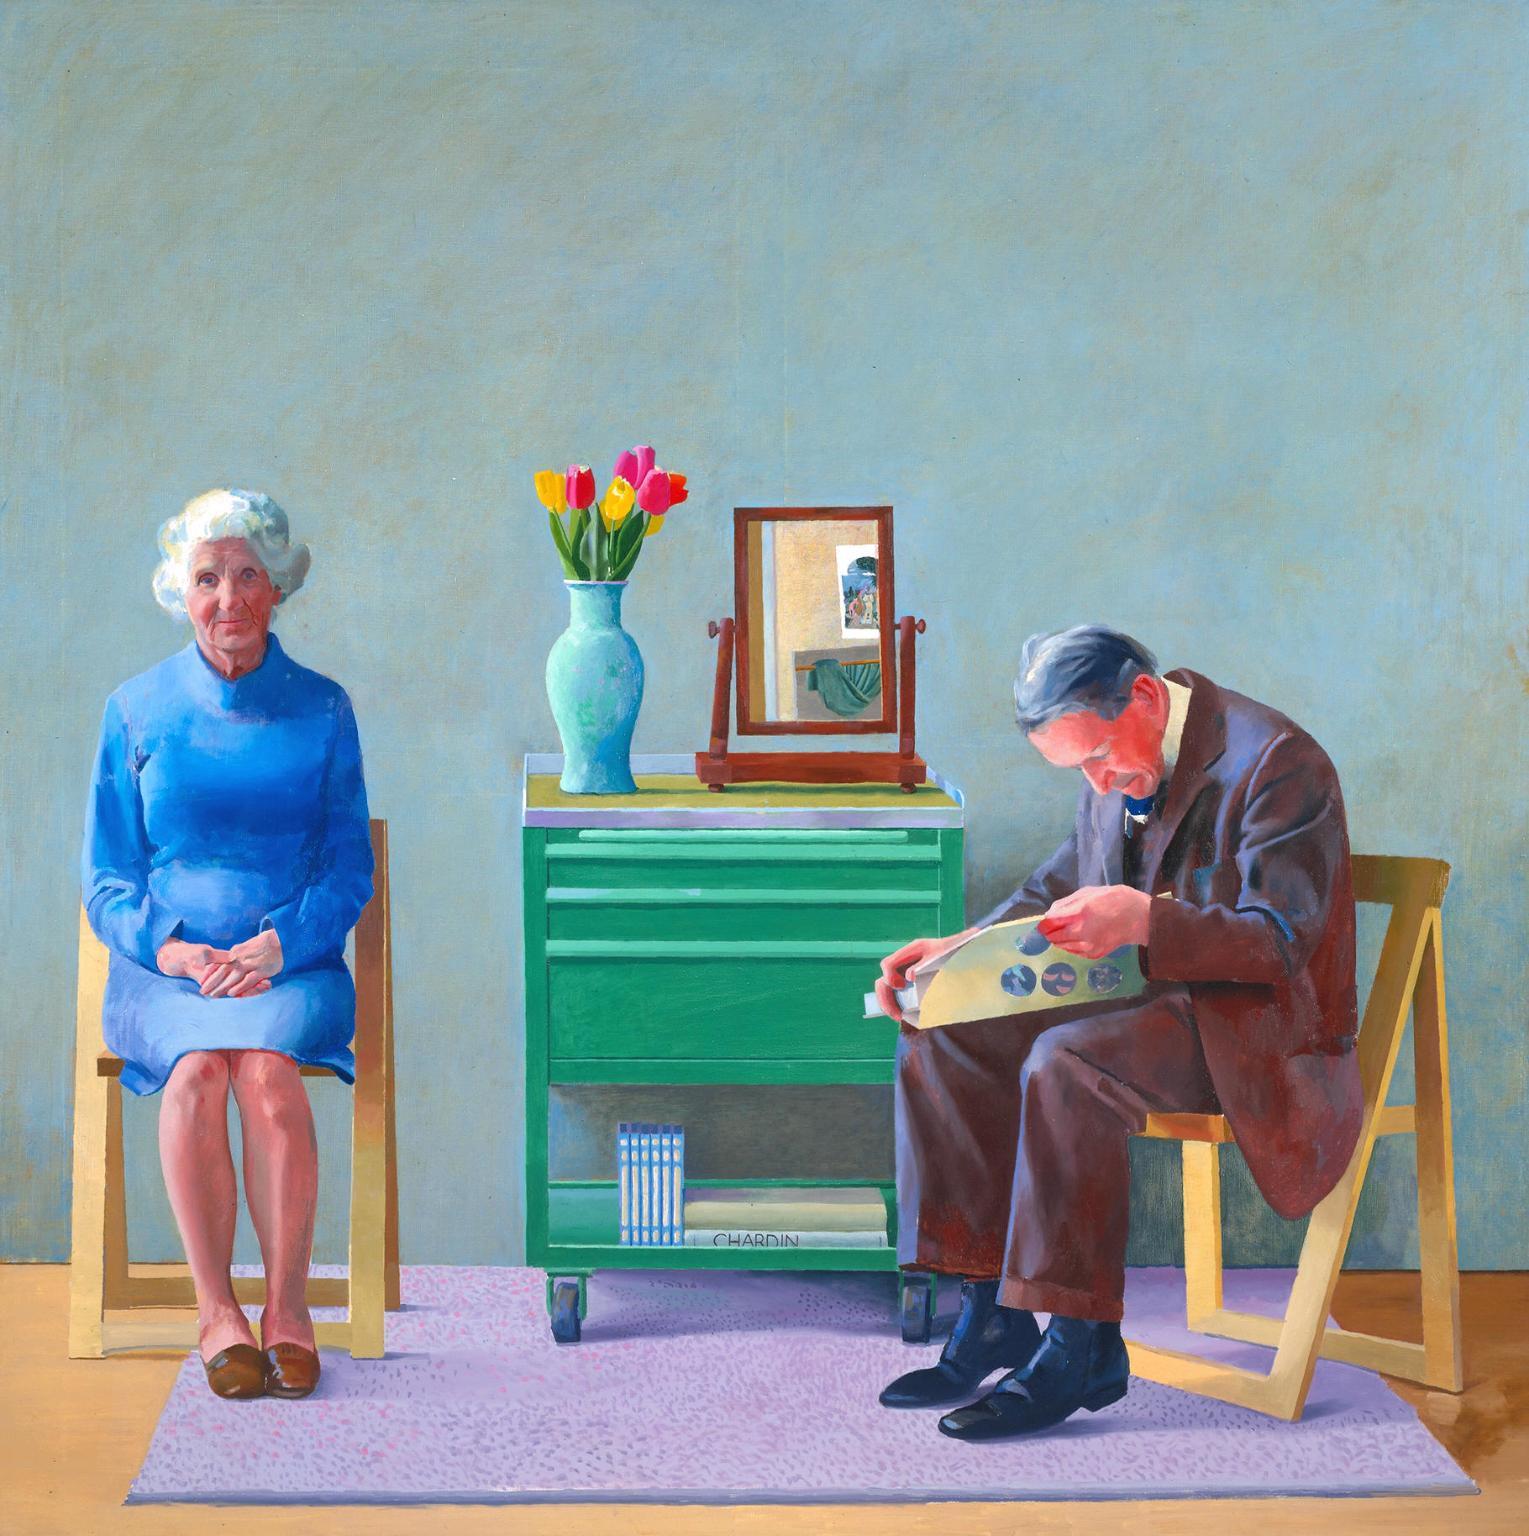 David Hockney - My Parents